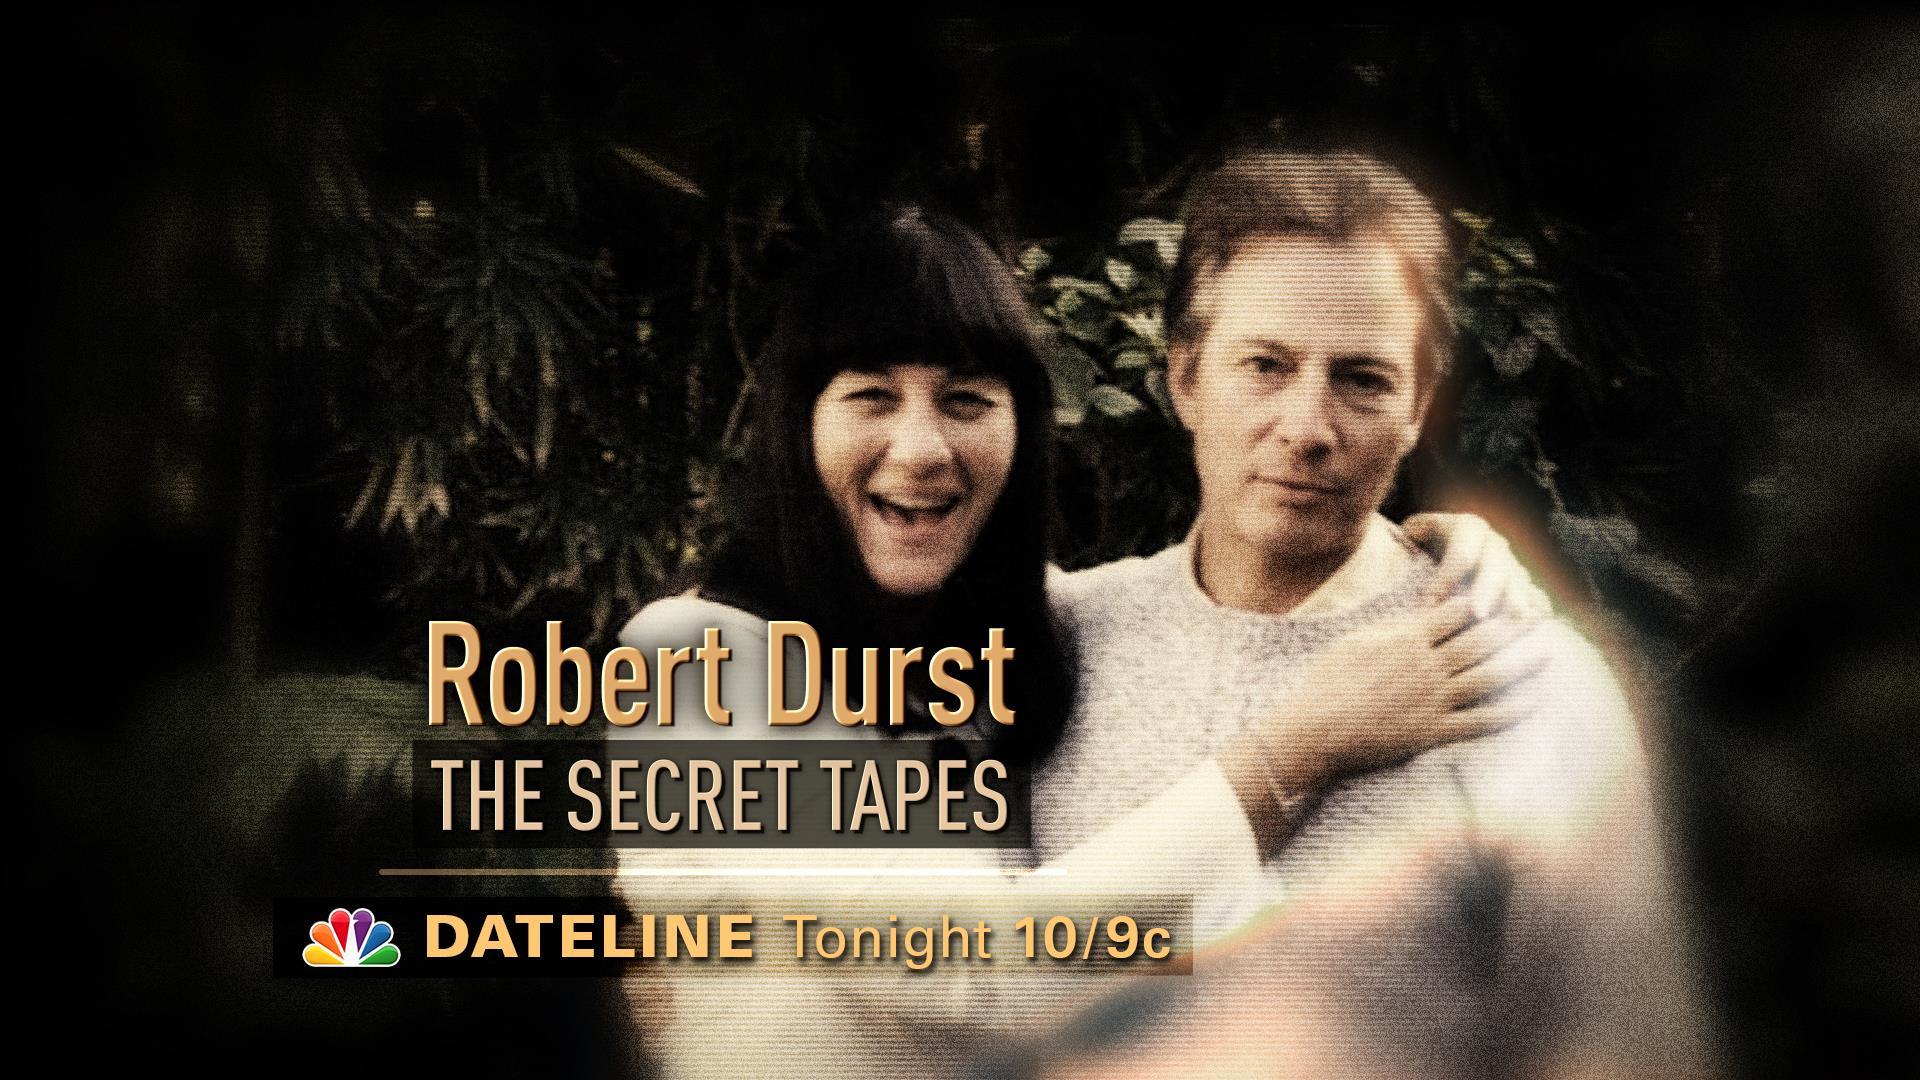 DATELINE MONDAY SNEAK PEEK: Robert Durst -- The Secret Tapes